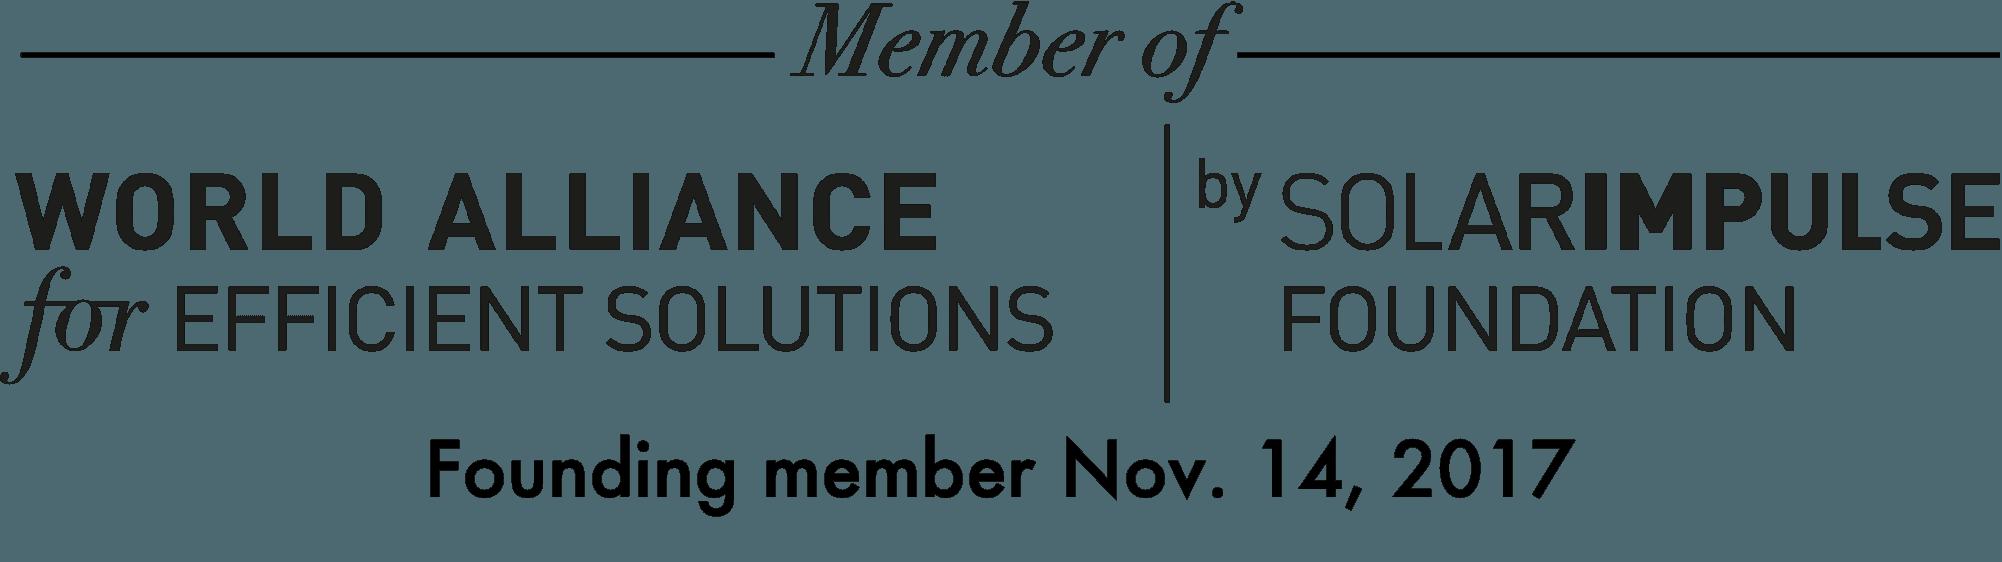 Label 1000 Efficient Solution - Solar Impulse Foundation